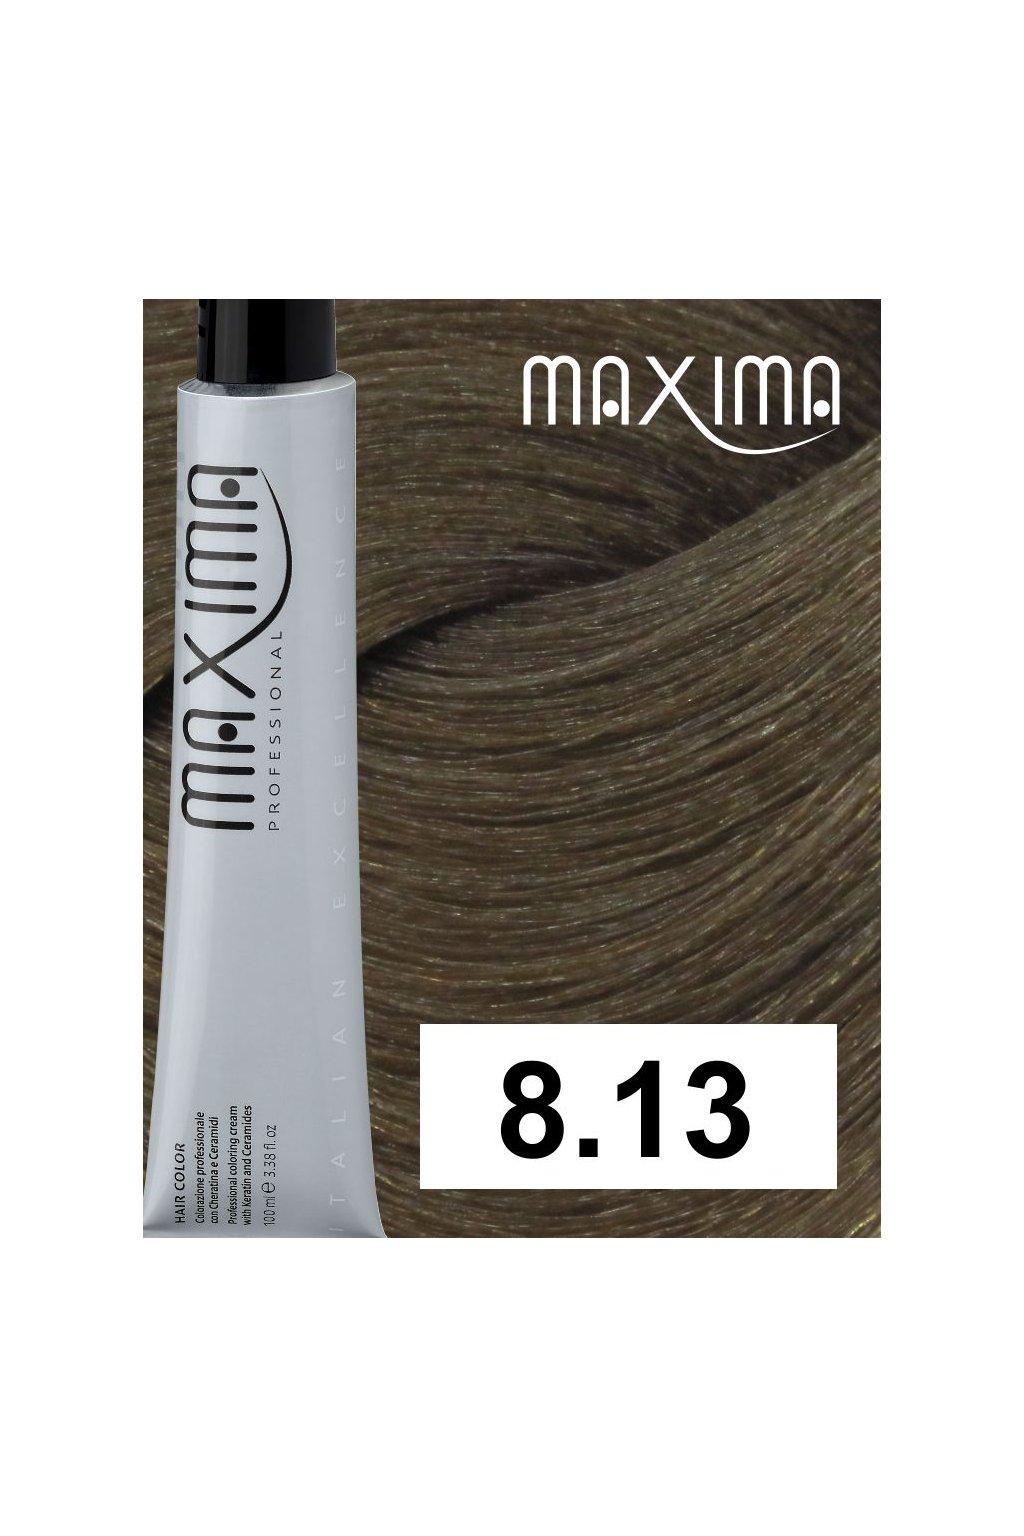 8 13 max